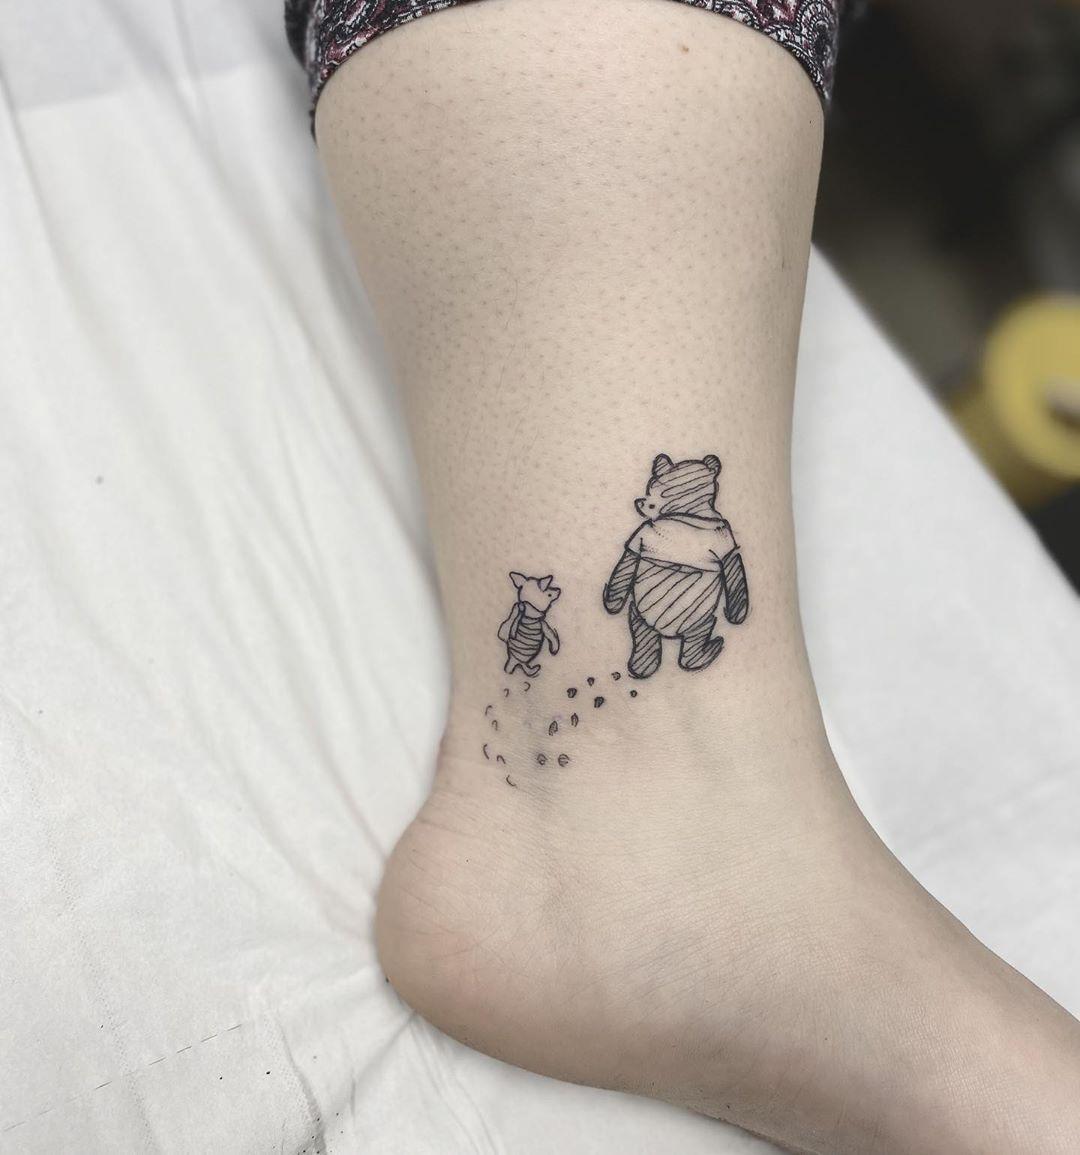 UPDATED: 40 Uplifting Winnie the Pooh Tattoos (April 2020)